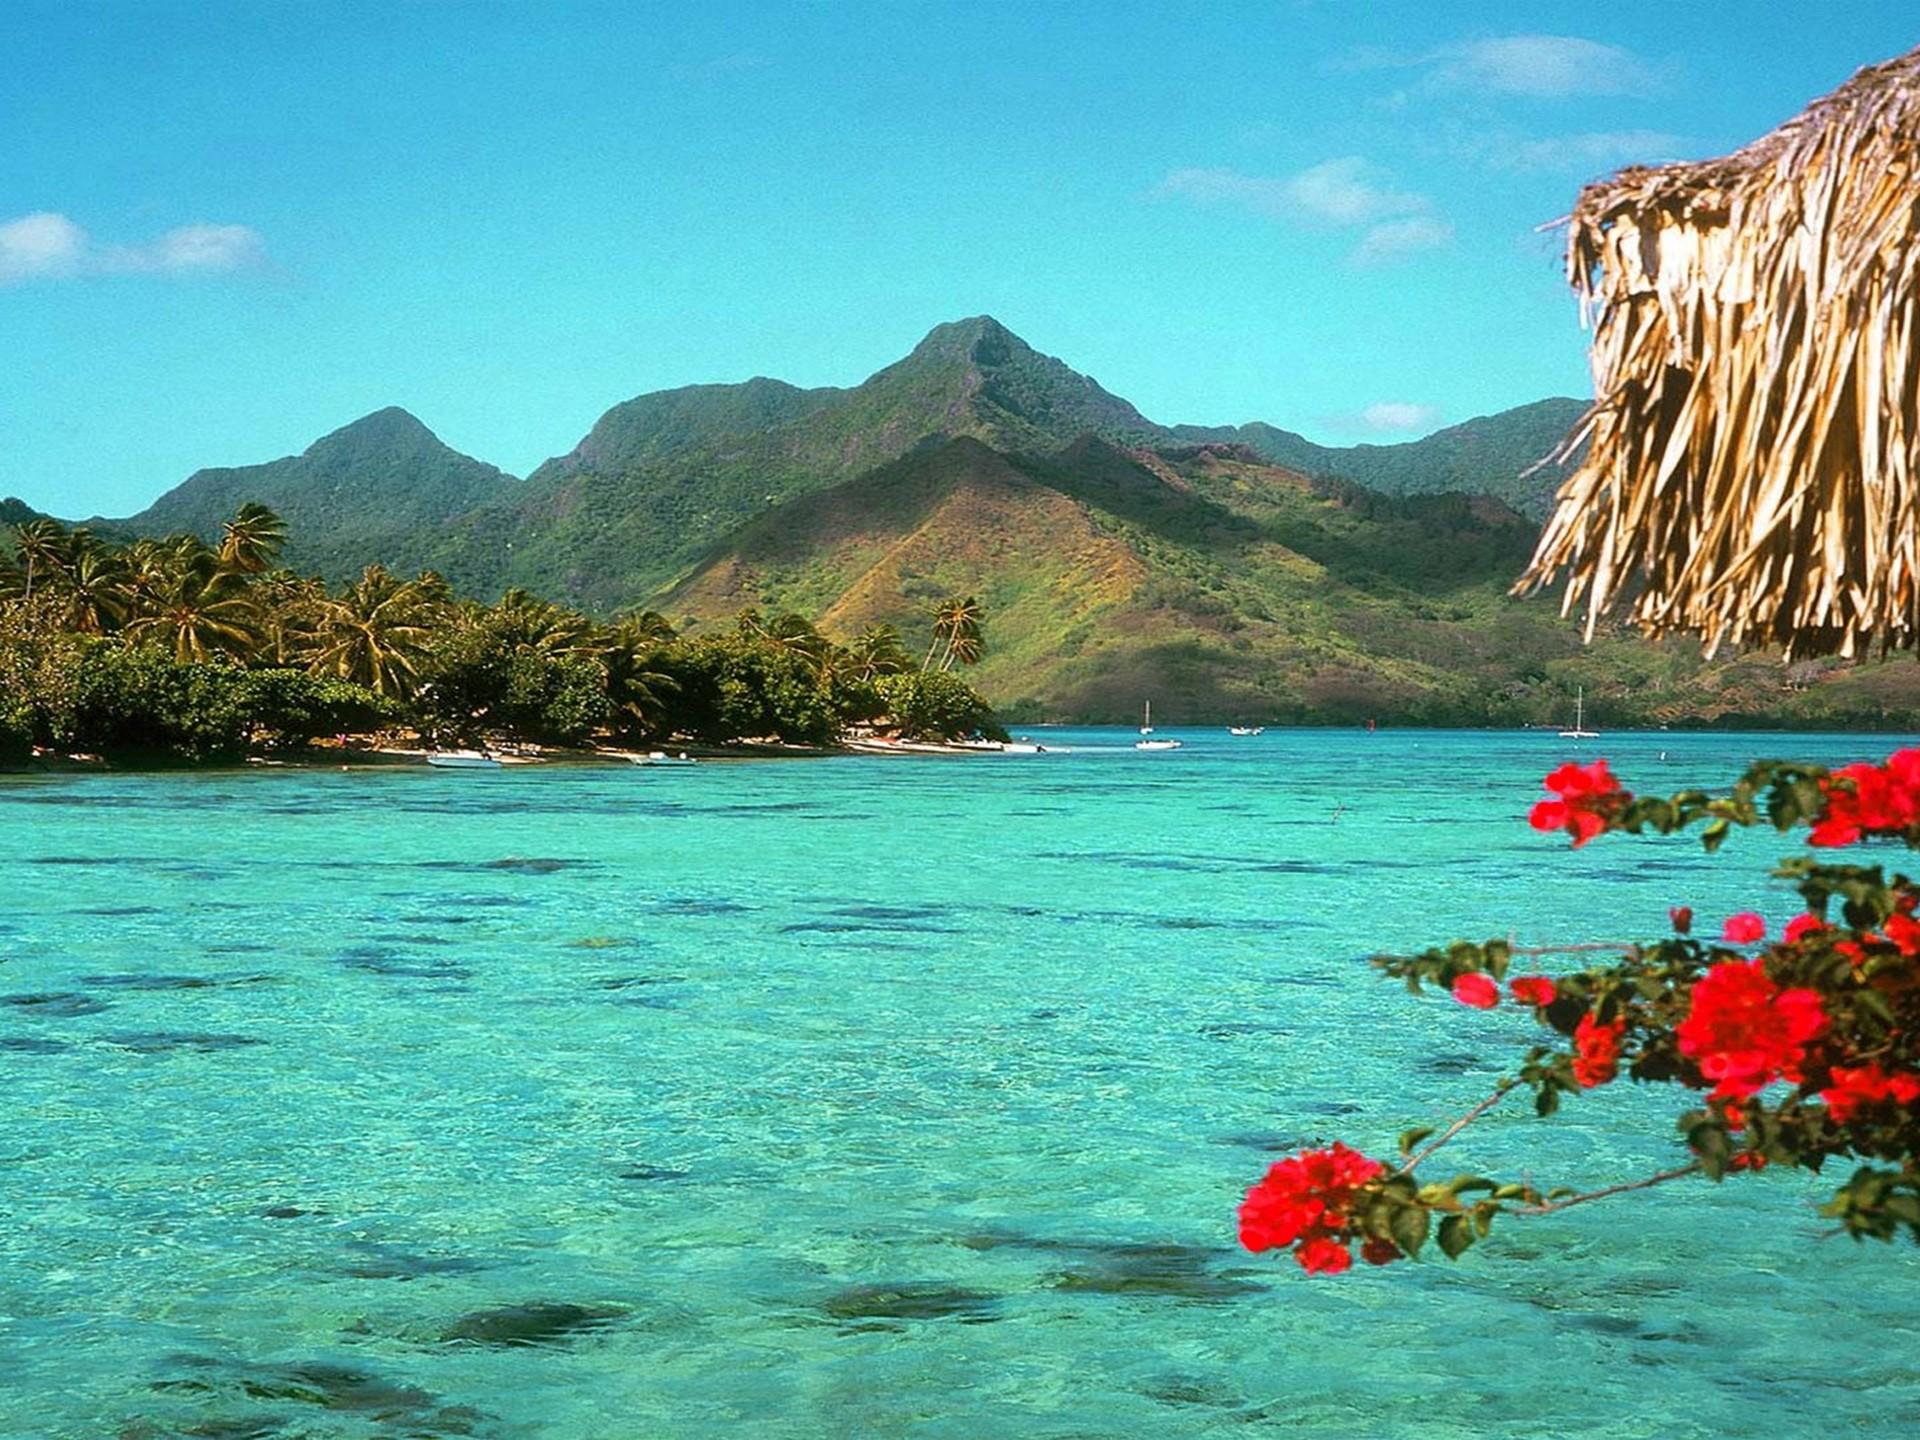 Hd Tropical Island Beach Paradise Wallpapers And Backgrounds: [58+] Tropical Beach Wallpapers On WallpaperSafari